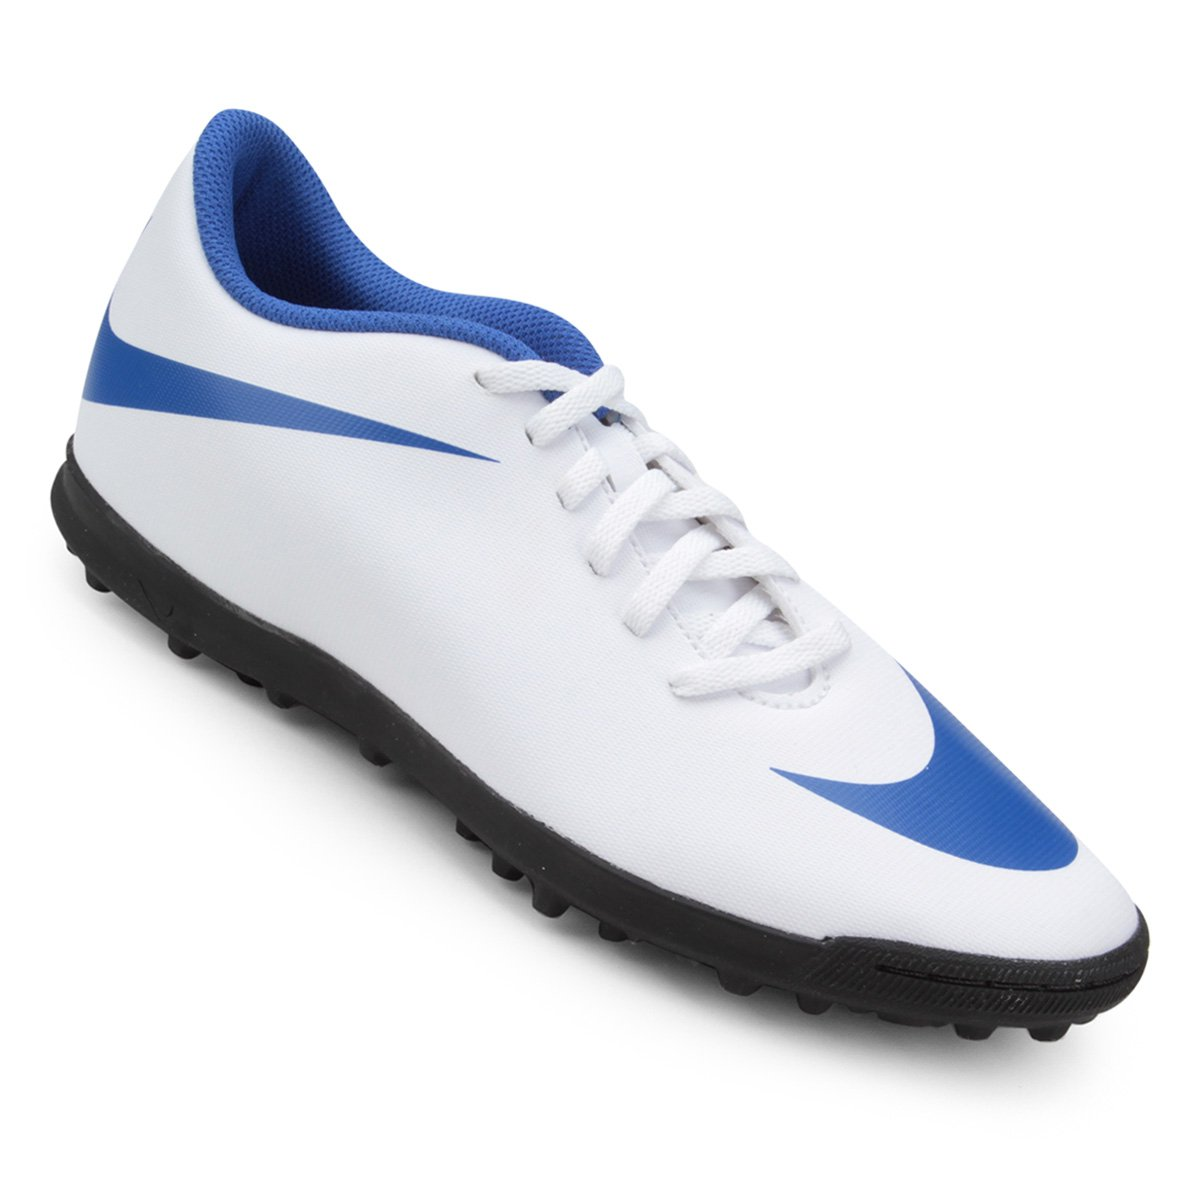 d2eaf731f1 Chuteira Society Nike Bravata 2 TF - Branco e Azul